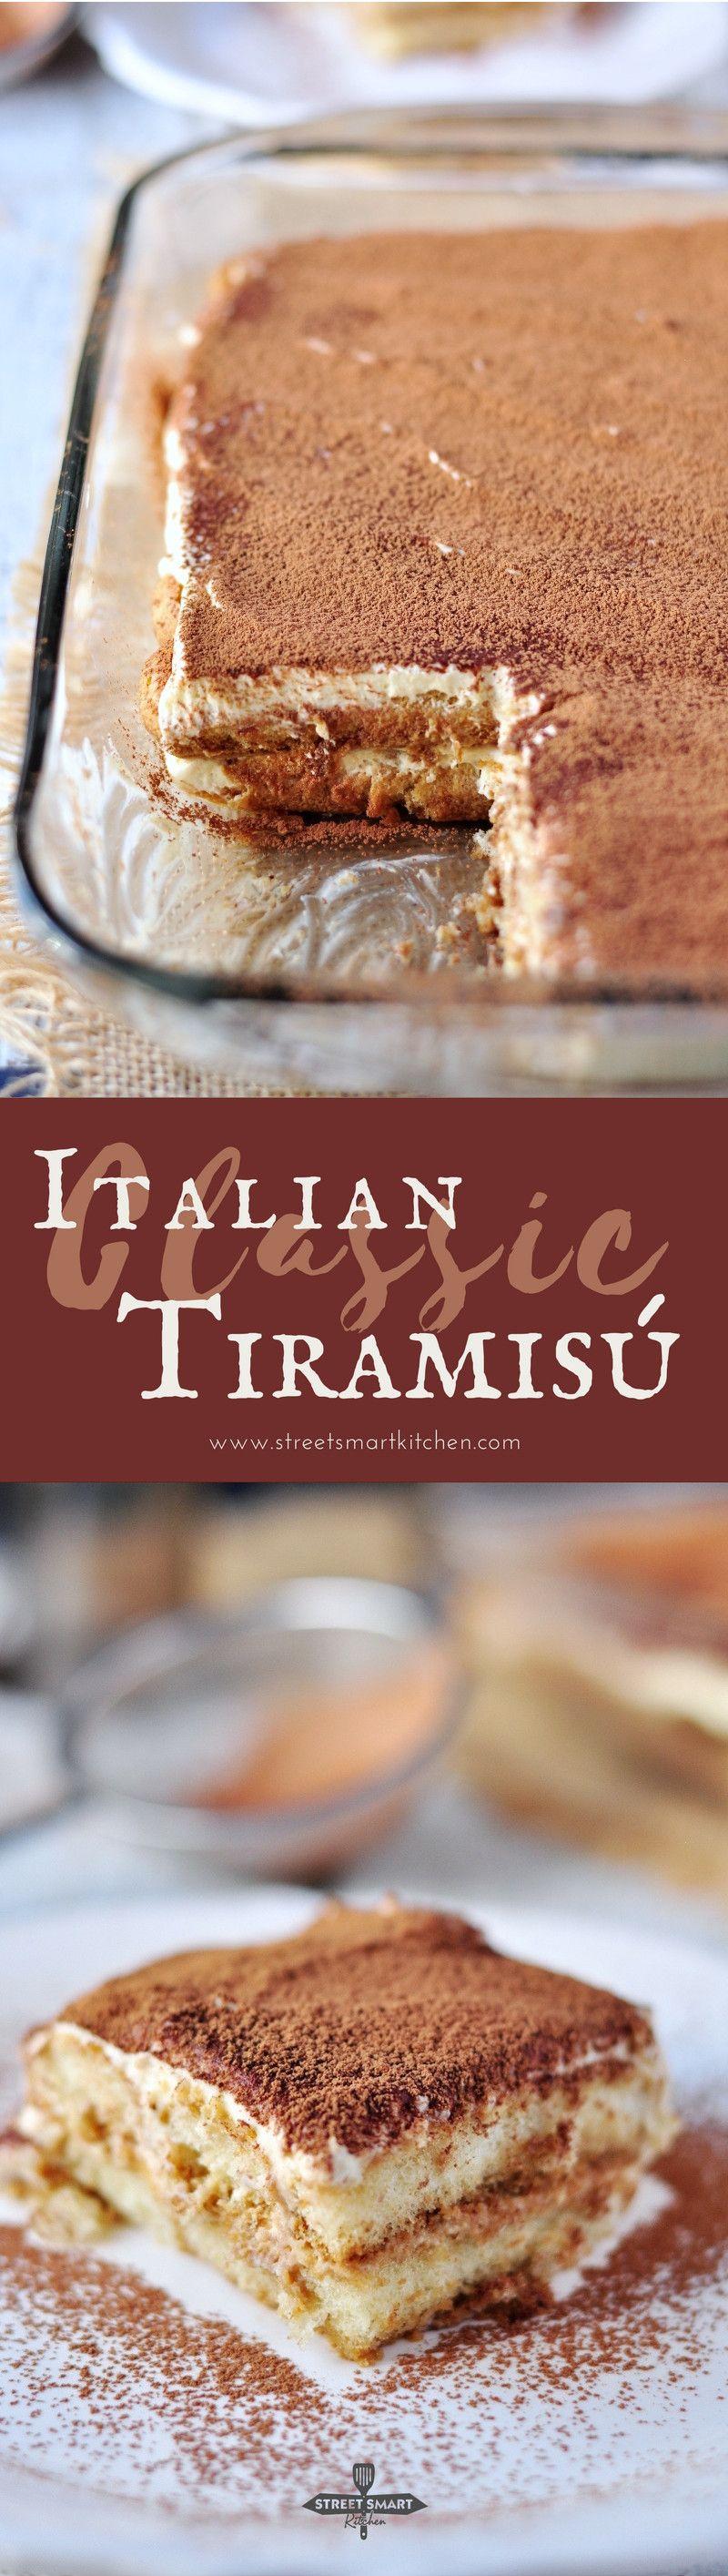 When The Original Can T Really Be Improved It S A Classic This Classic Italian Tiramisu Is One Of These Classics Wa Desserts Tiramisu Recipe Dessert Recipes